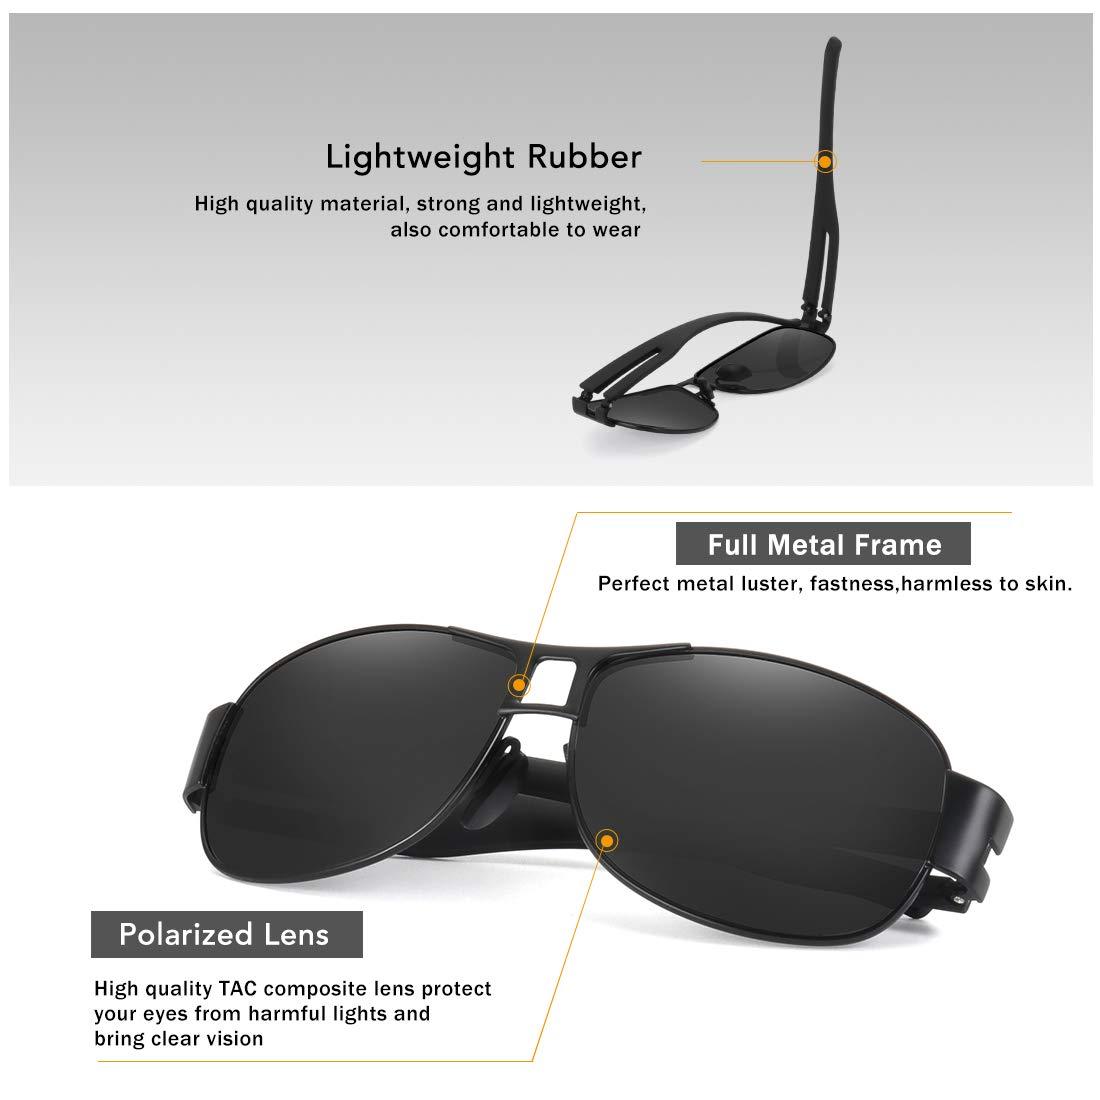 WOWSUN Classic Aviator Military Polarized Driving Sunglasses For Men | Ultralight Alloy Frame with 100% UV400 Protection (Black Lens Black Metal Frame)